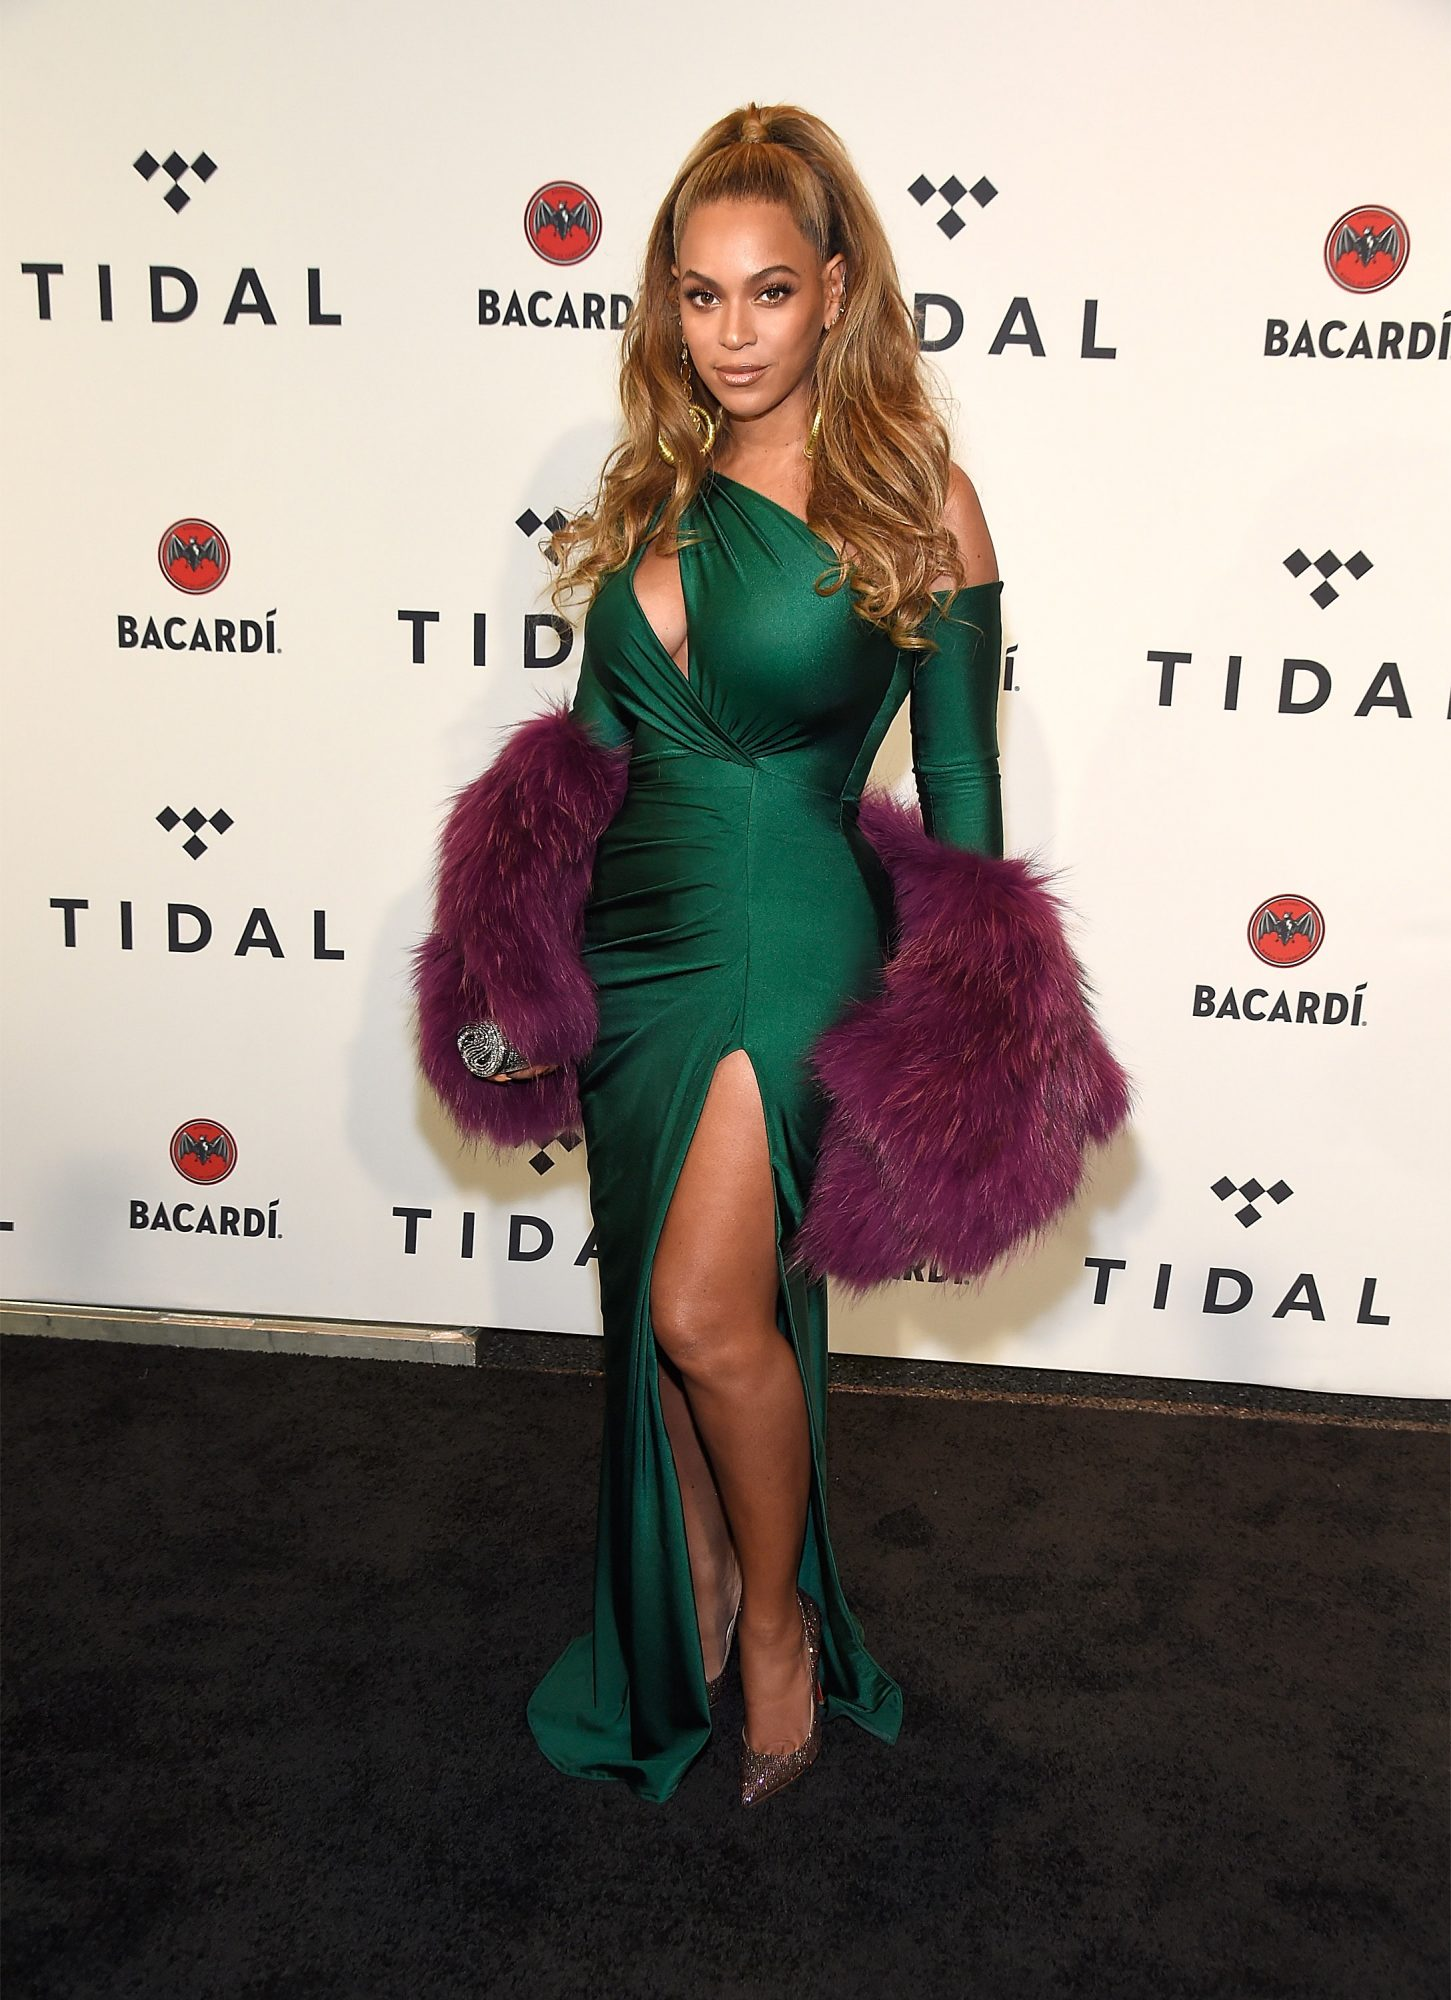 BeyonceWalterMendezdressfurstole.jpg